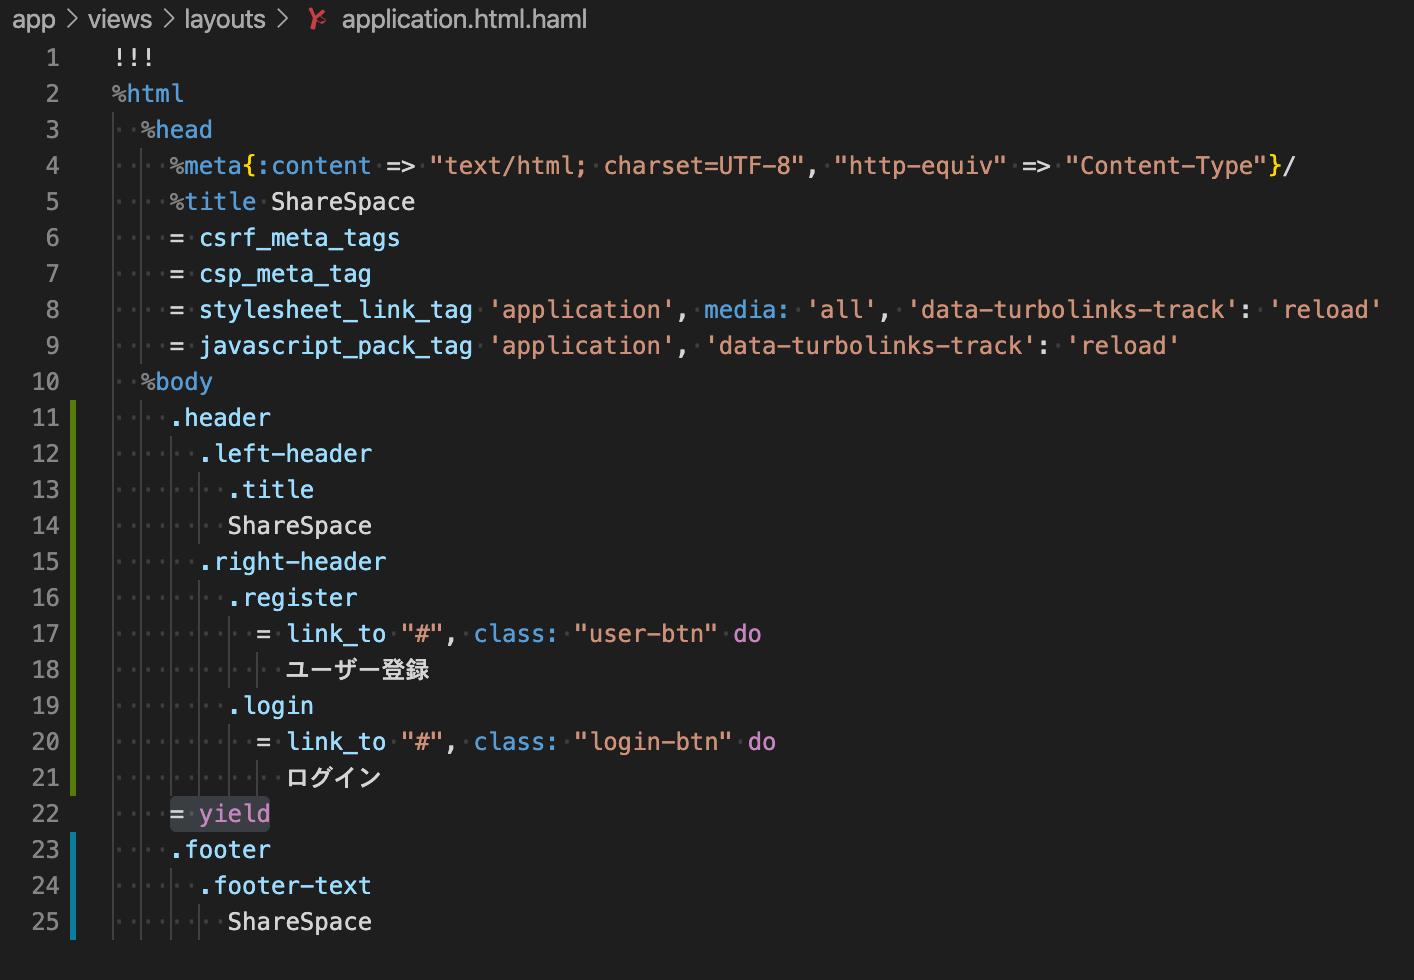 Screenshot 2020-07-13 20.04.05.png